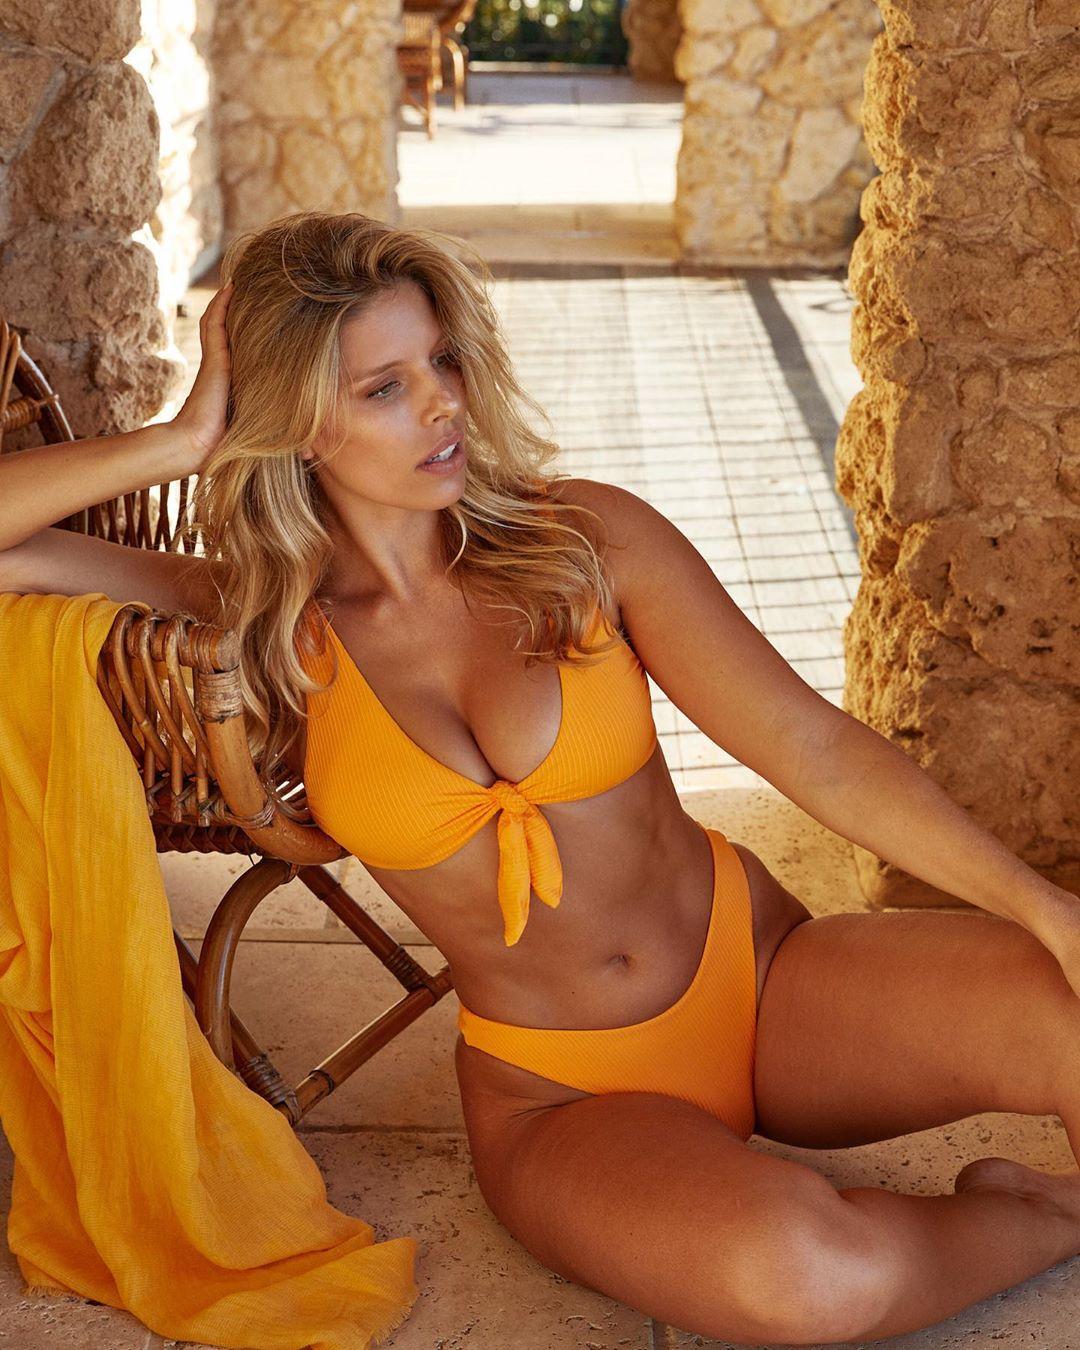 Natasha Oakley rocking Skimpy tangerine ribbed Monday Swimwear bikini bottom with a ribbed fabric material